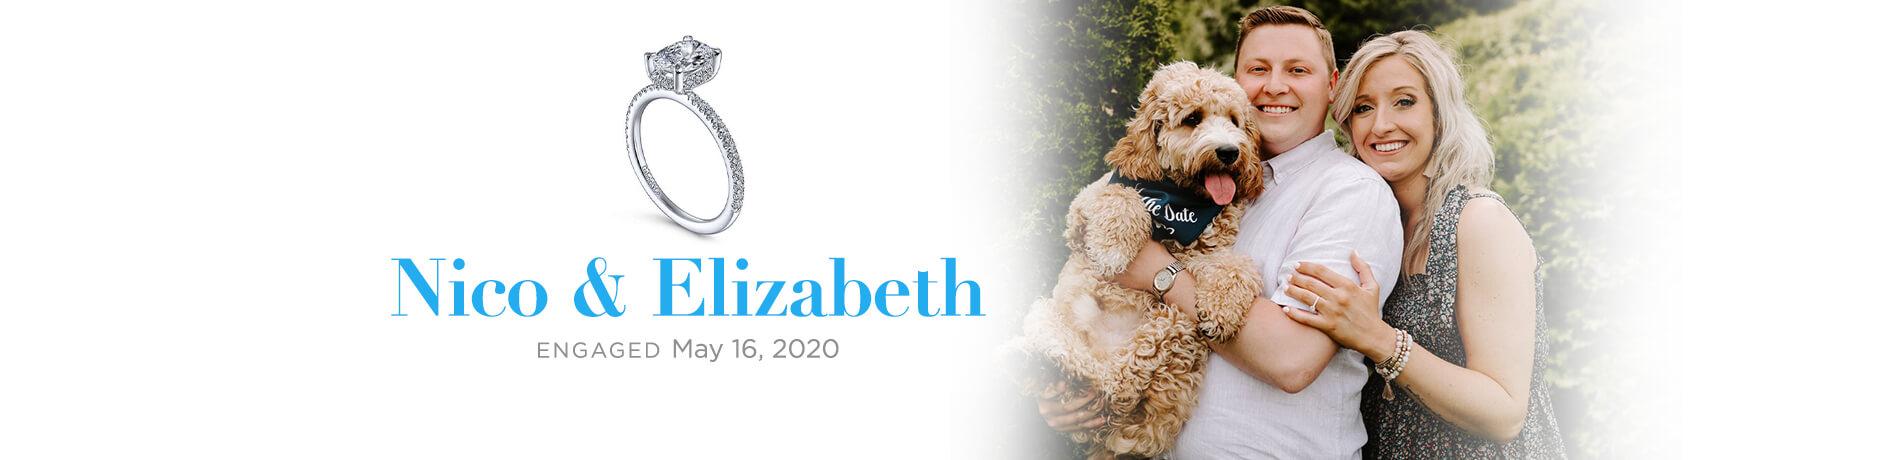 Nico and Elizabeth's Engagement